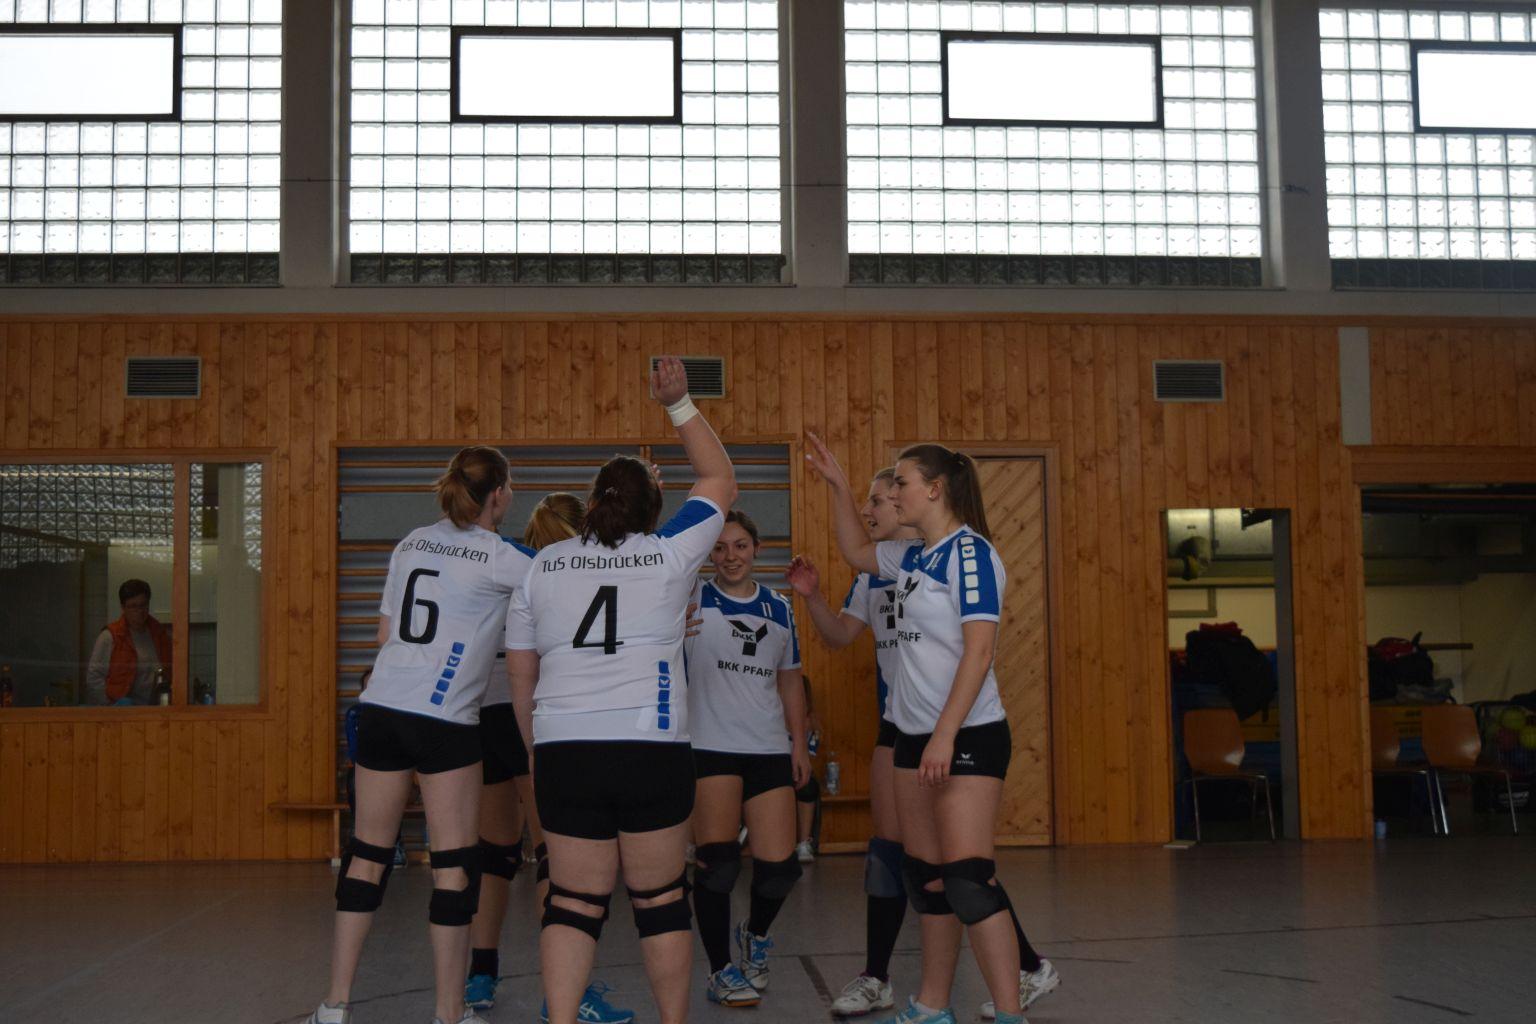 170311_Volleyball_DSC_0223